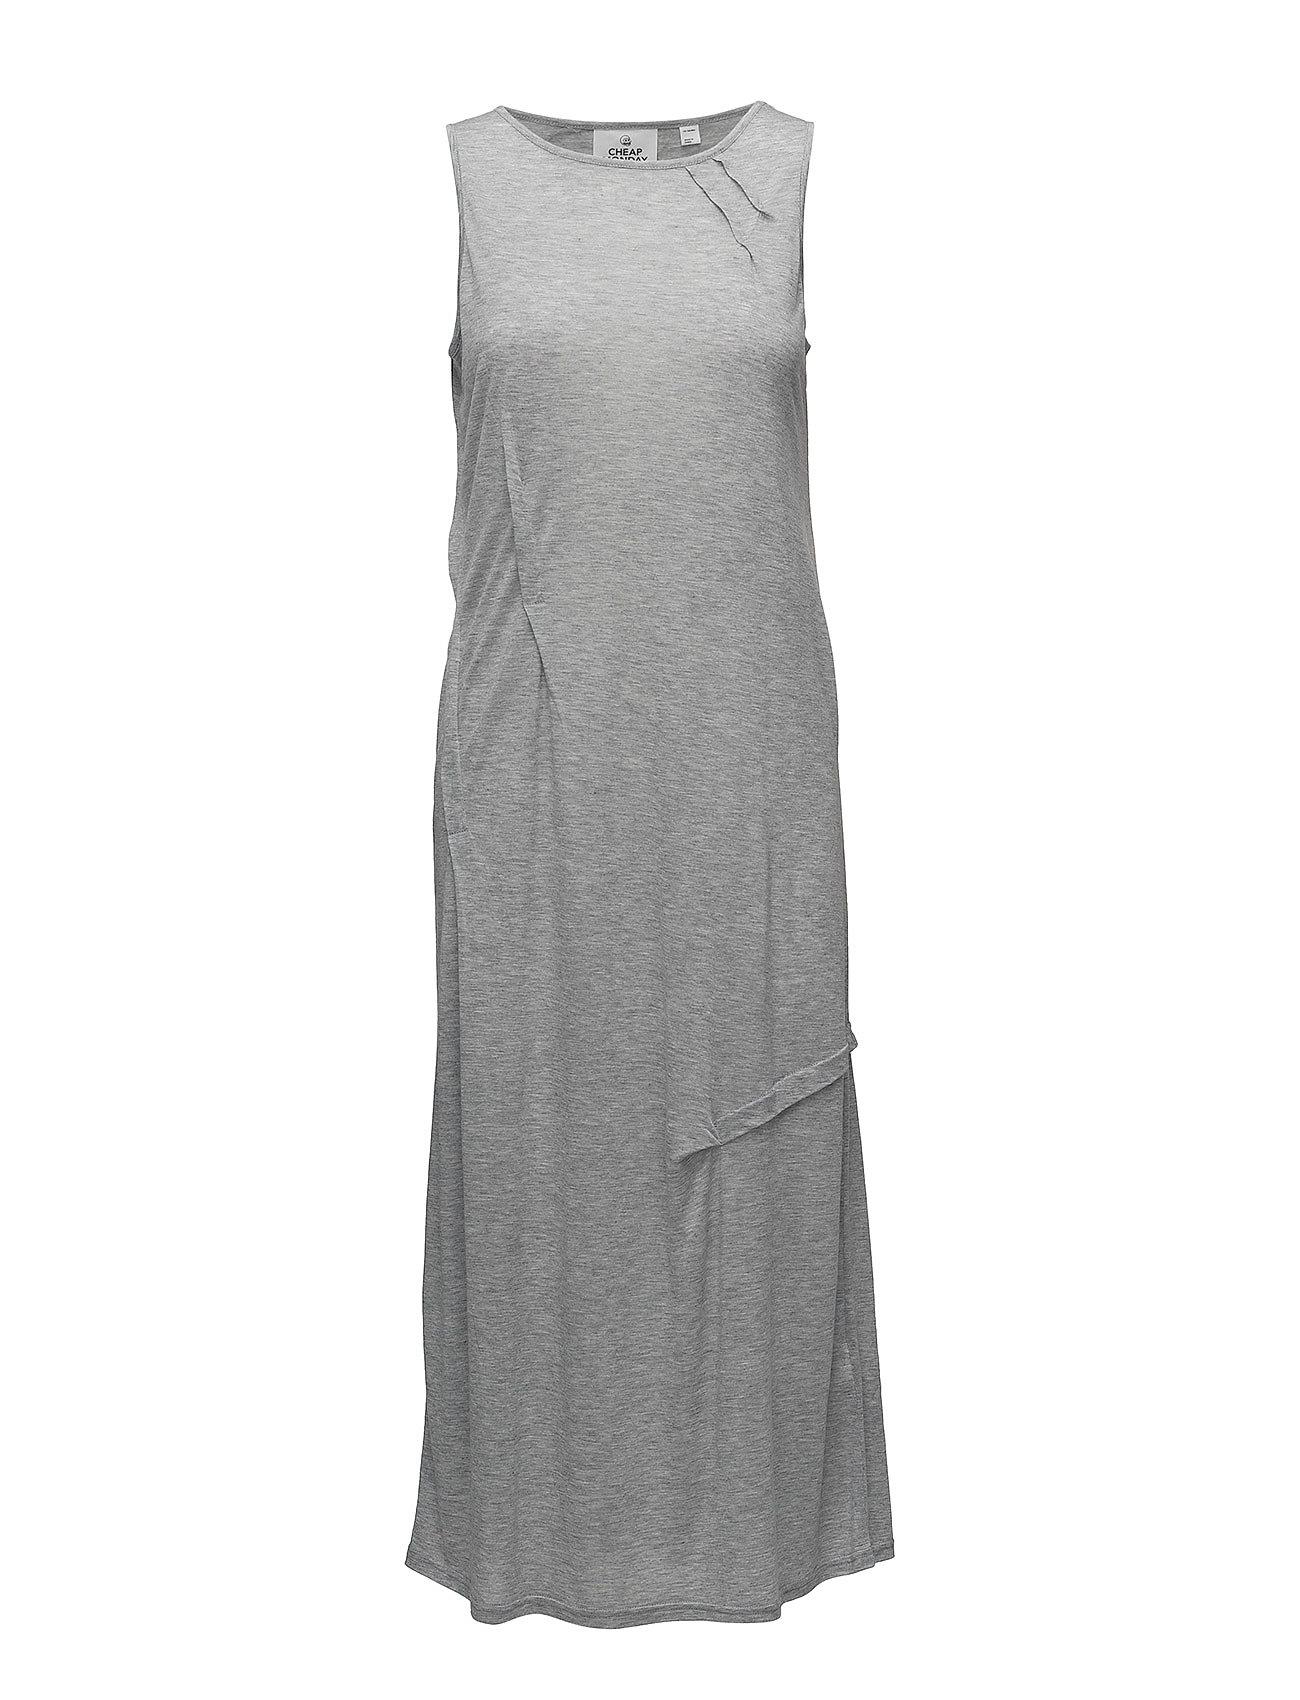 Cheap Monday Use dress - GREY MELANGE